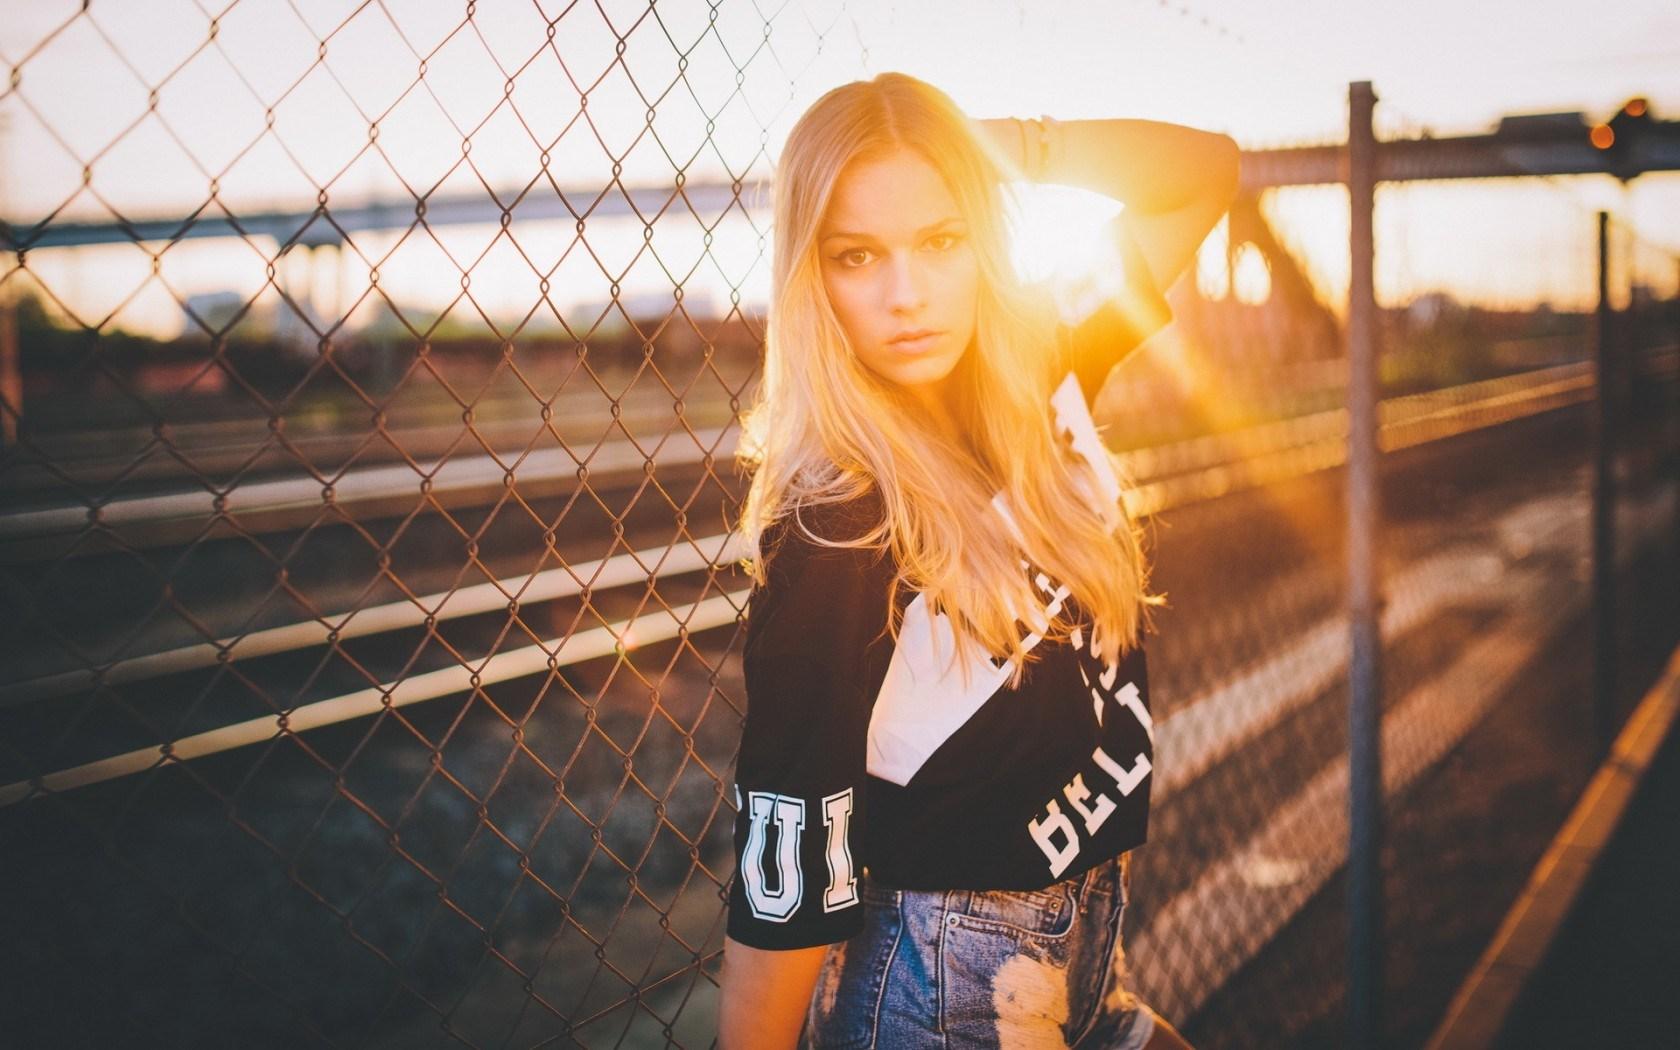 Fence Blonde Girl Model Sun